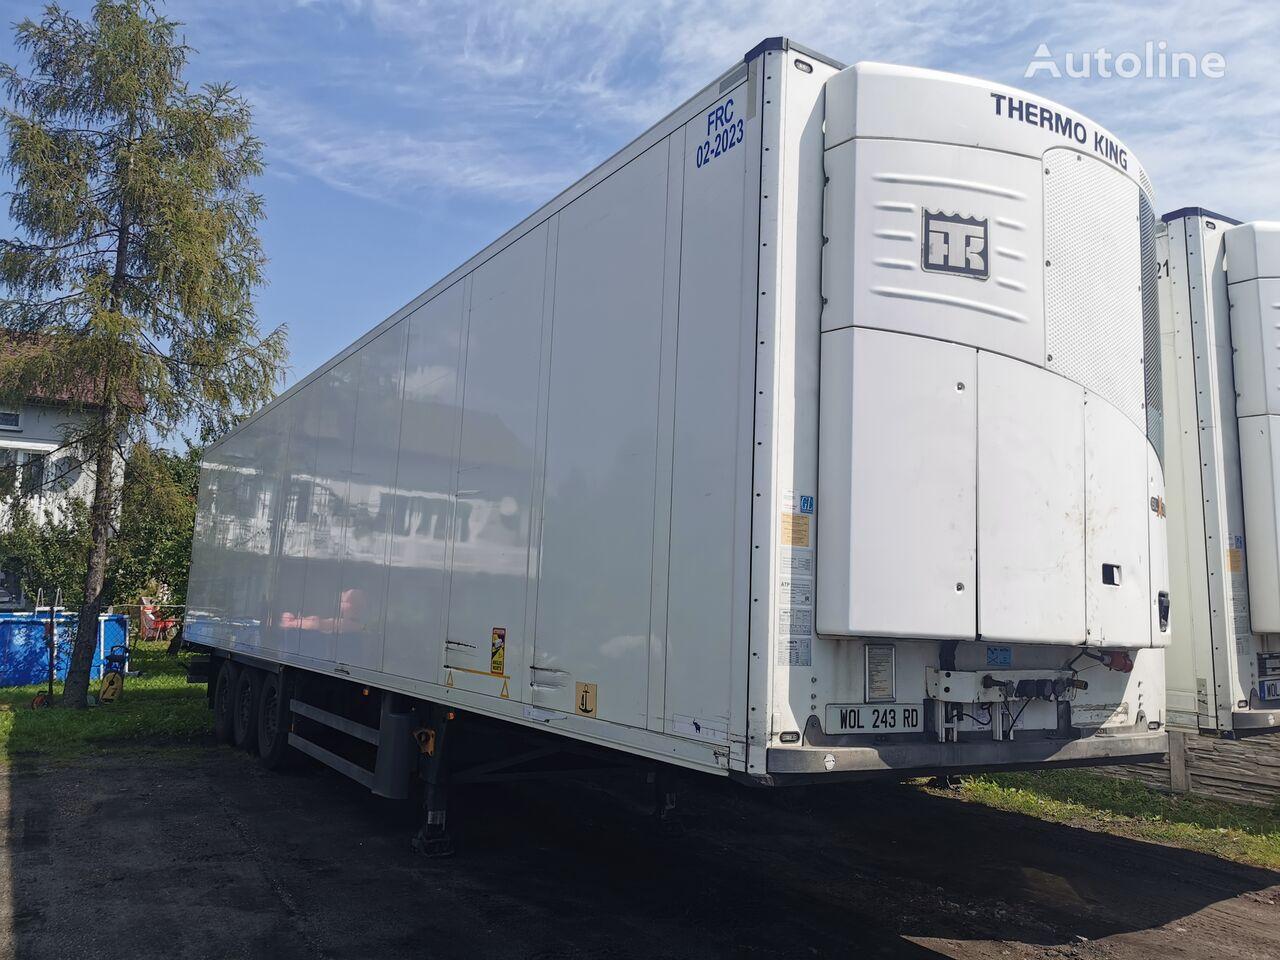 SCHMITZ CARGOBULL Sko24 refrigerated semi-trailer